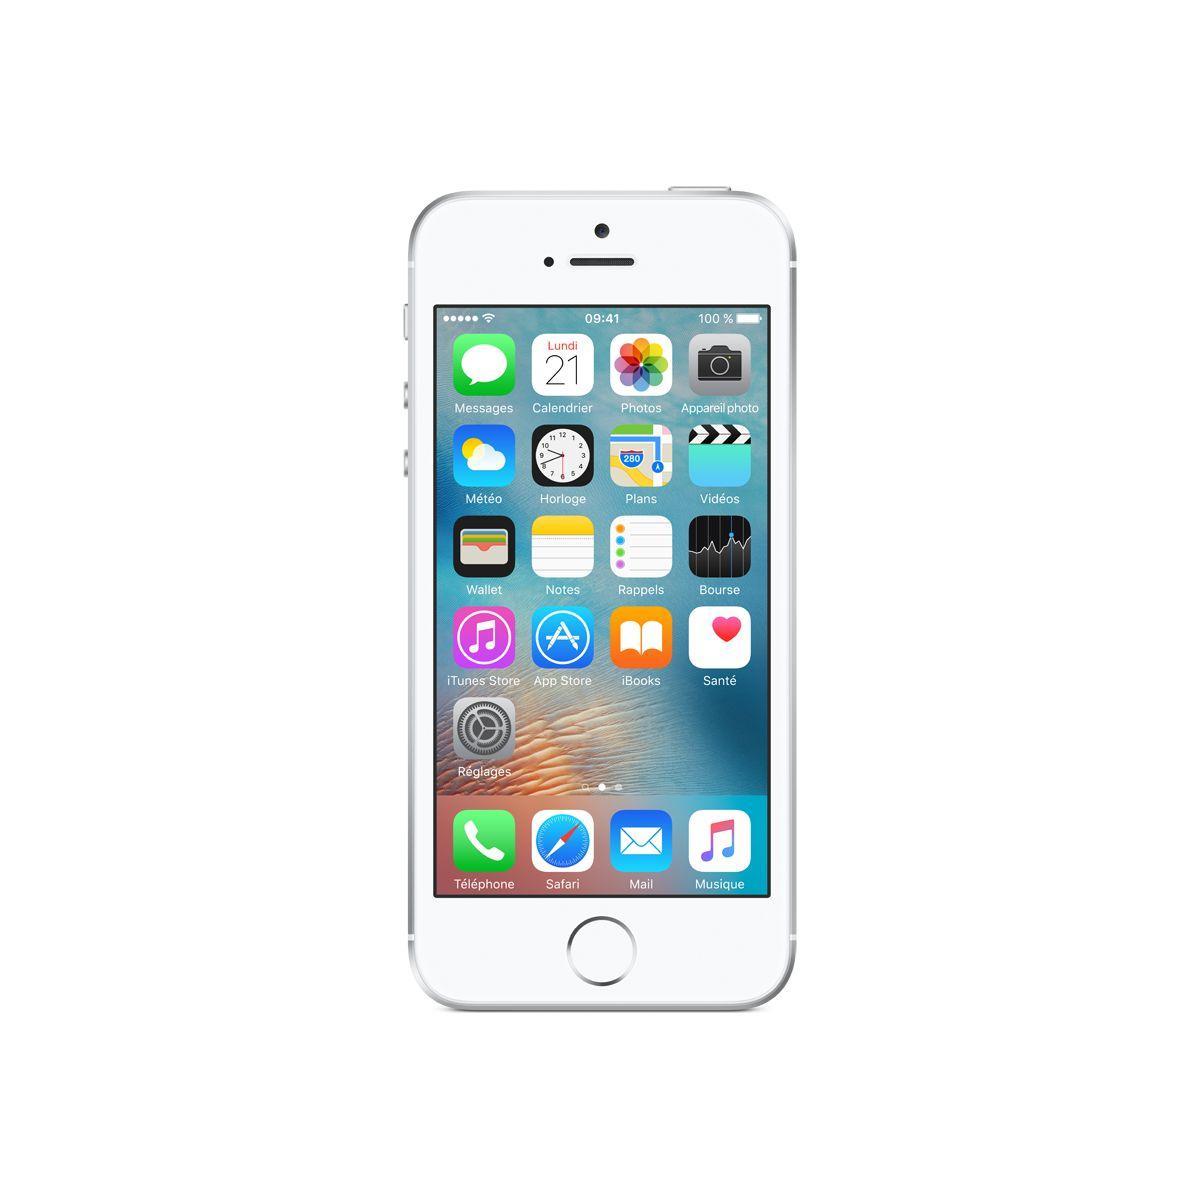 Smartphone apple iphone se 32go silver - livraison offerte : code livrelais